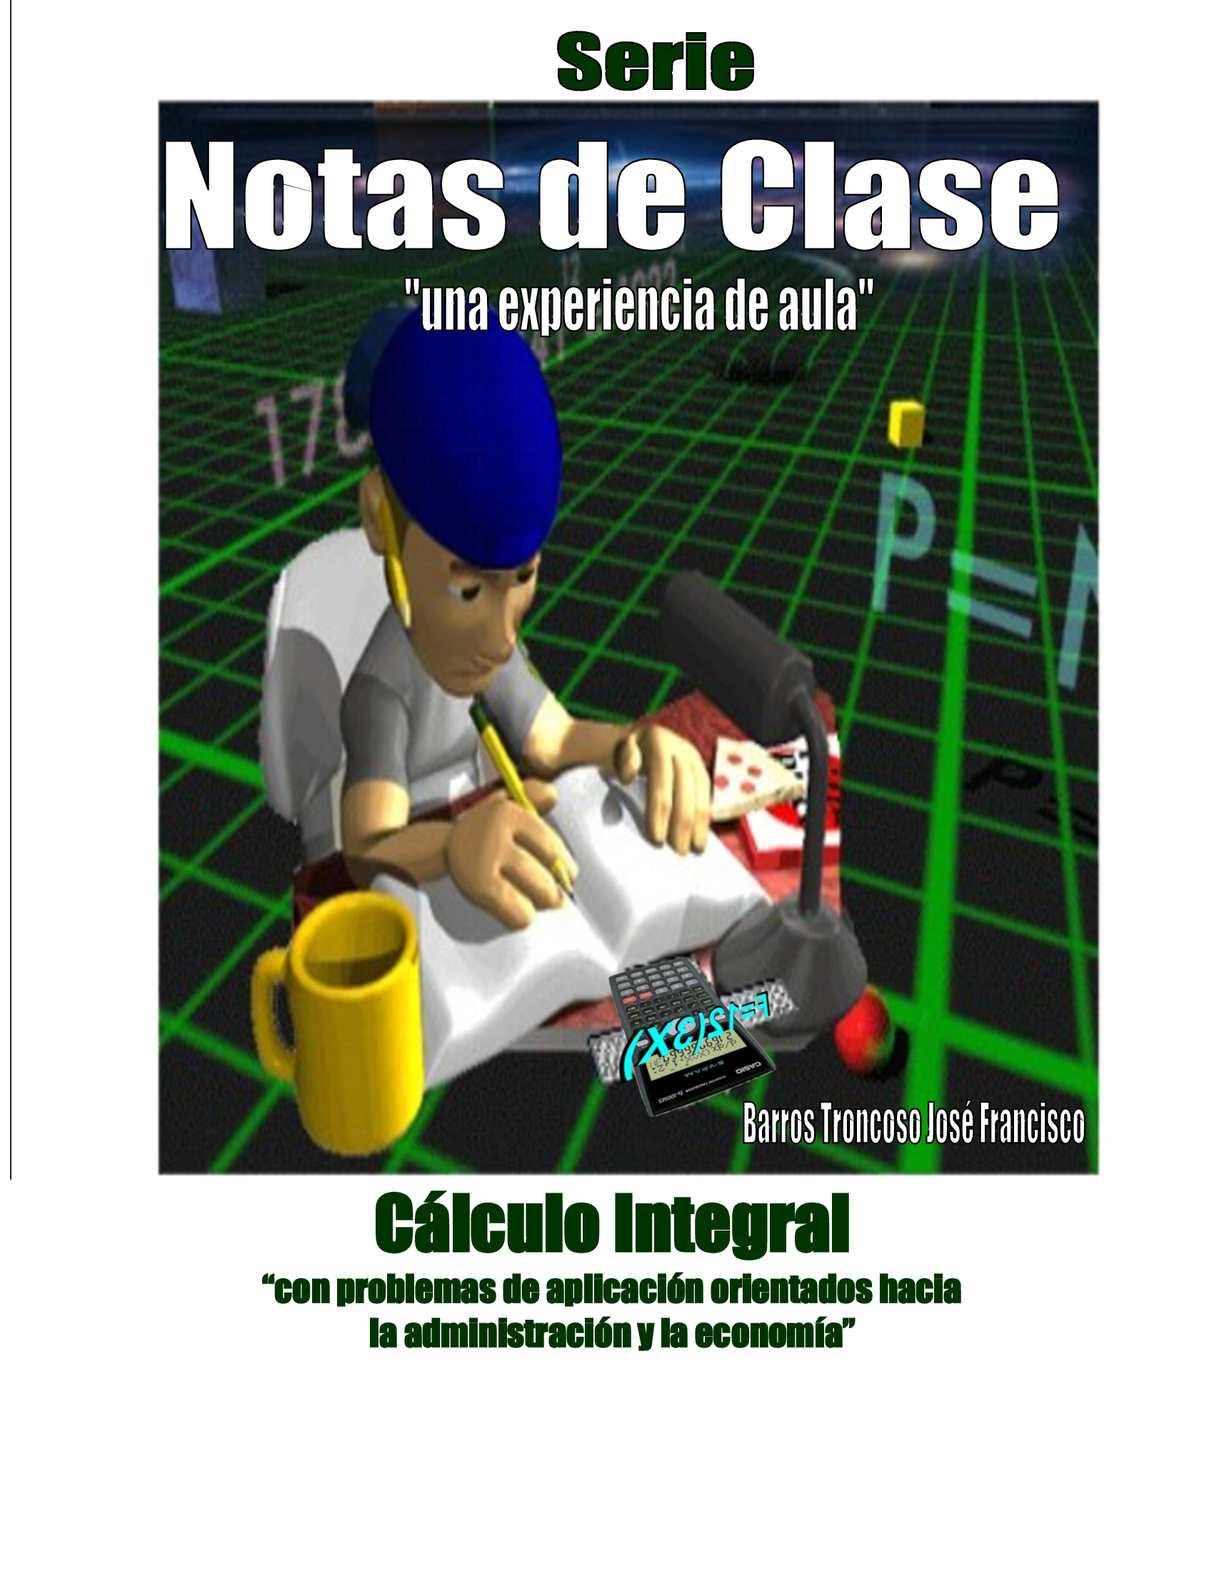 Manual de Cálculo Integral